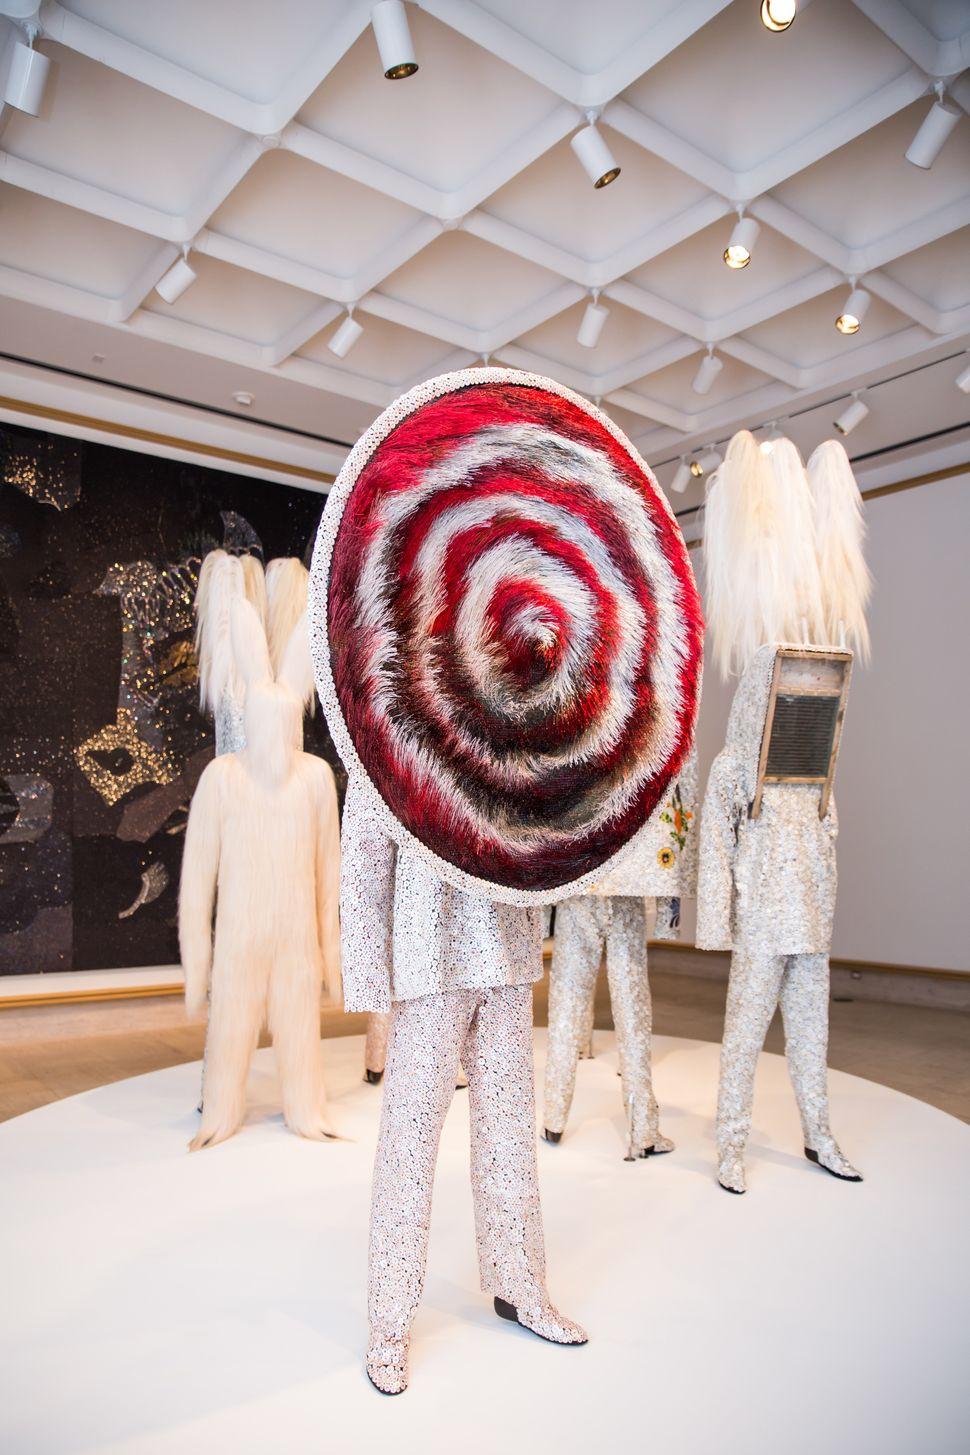 <span>Installation view of <em>Nick Cave: Here Hear&nbsp;</em></span>